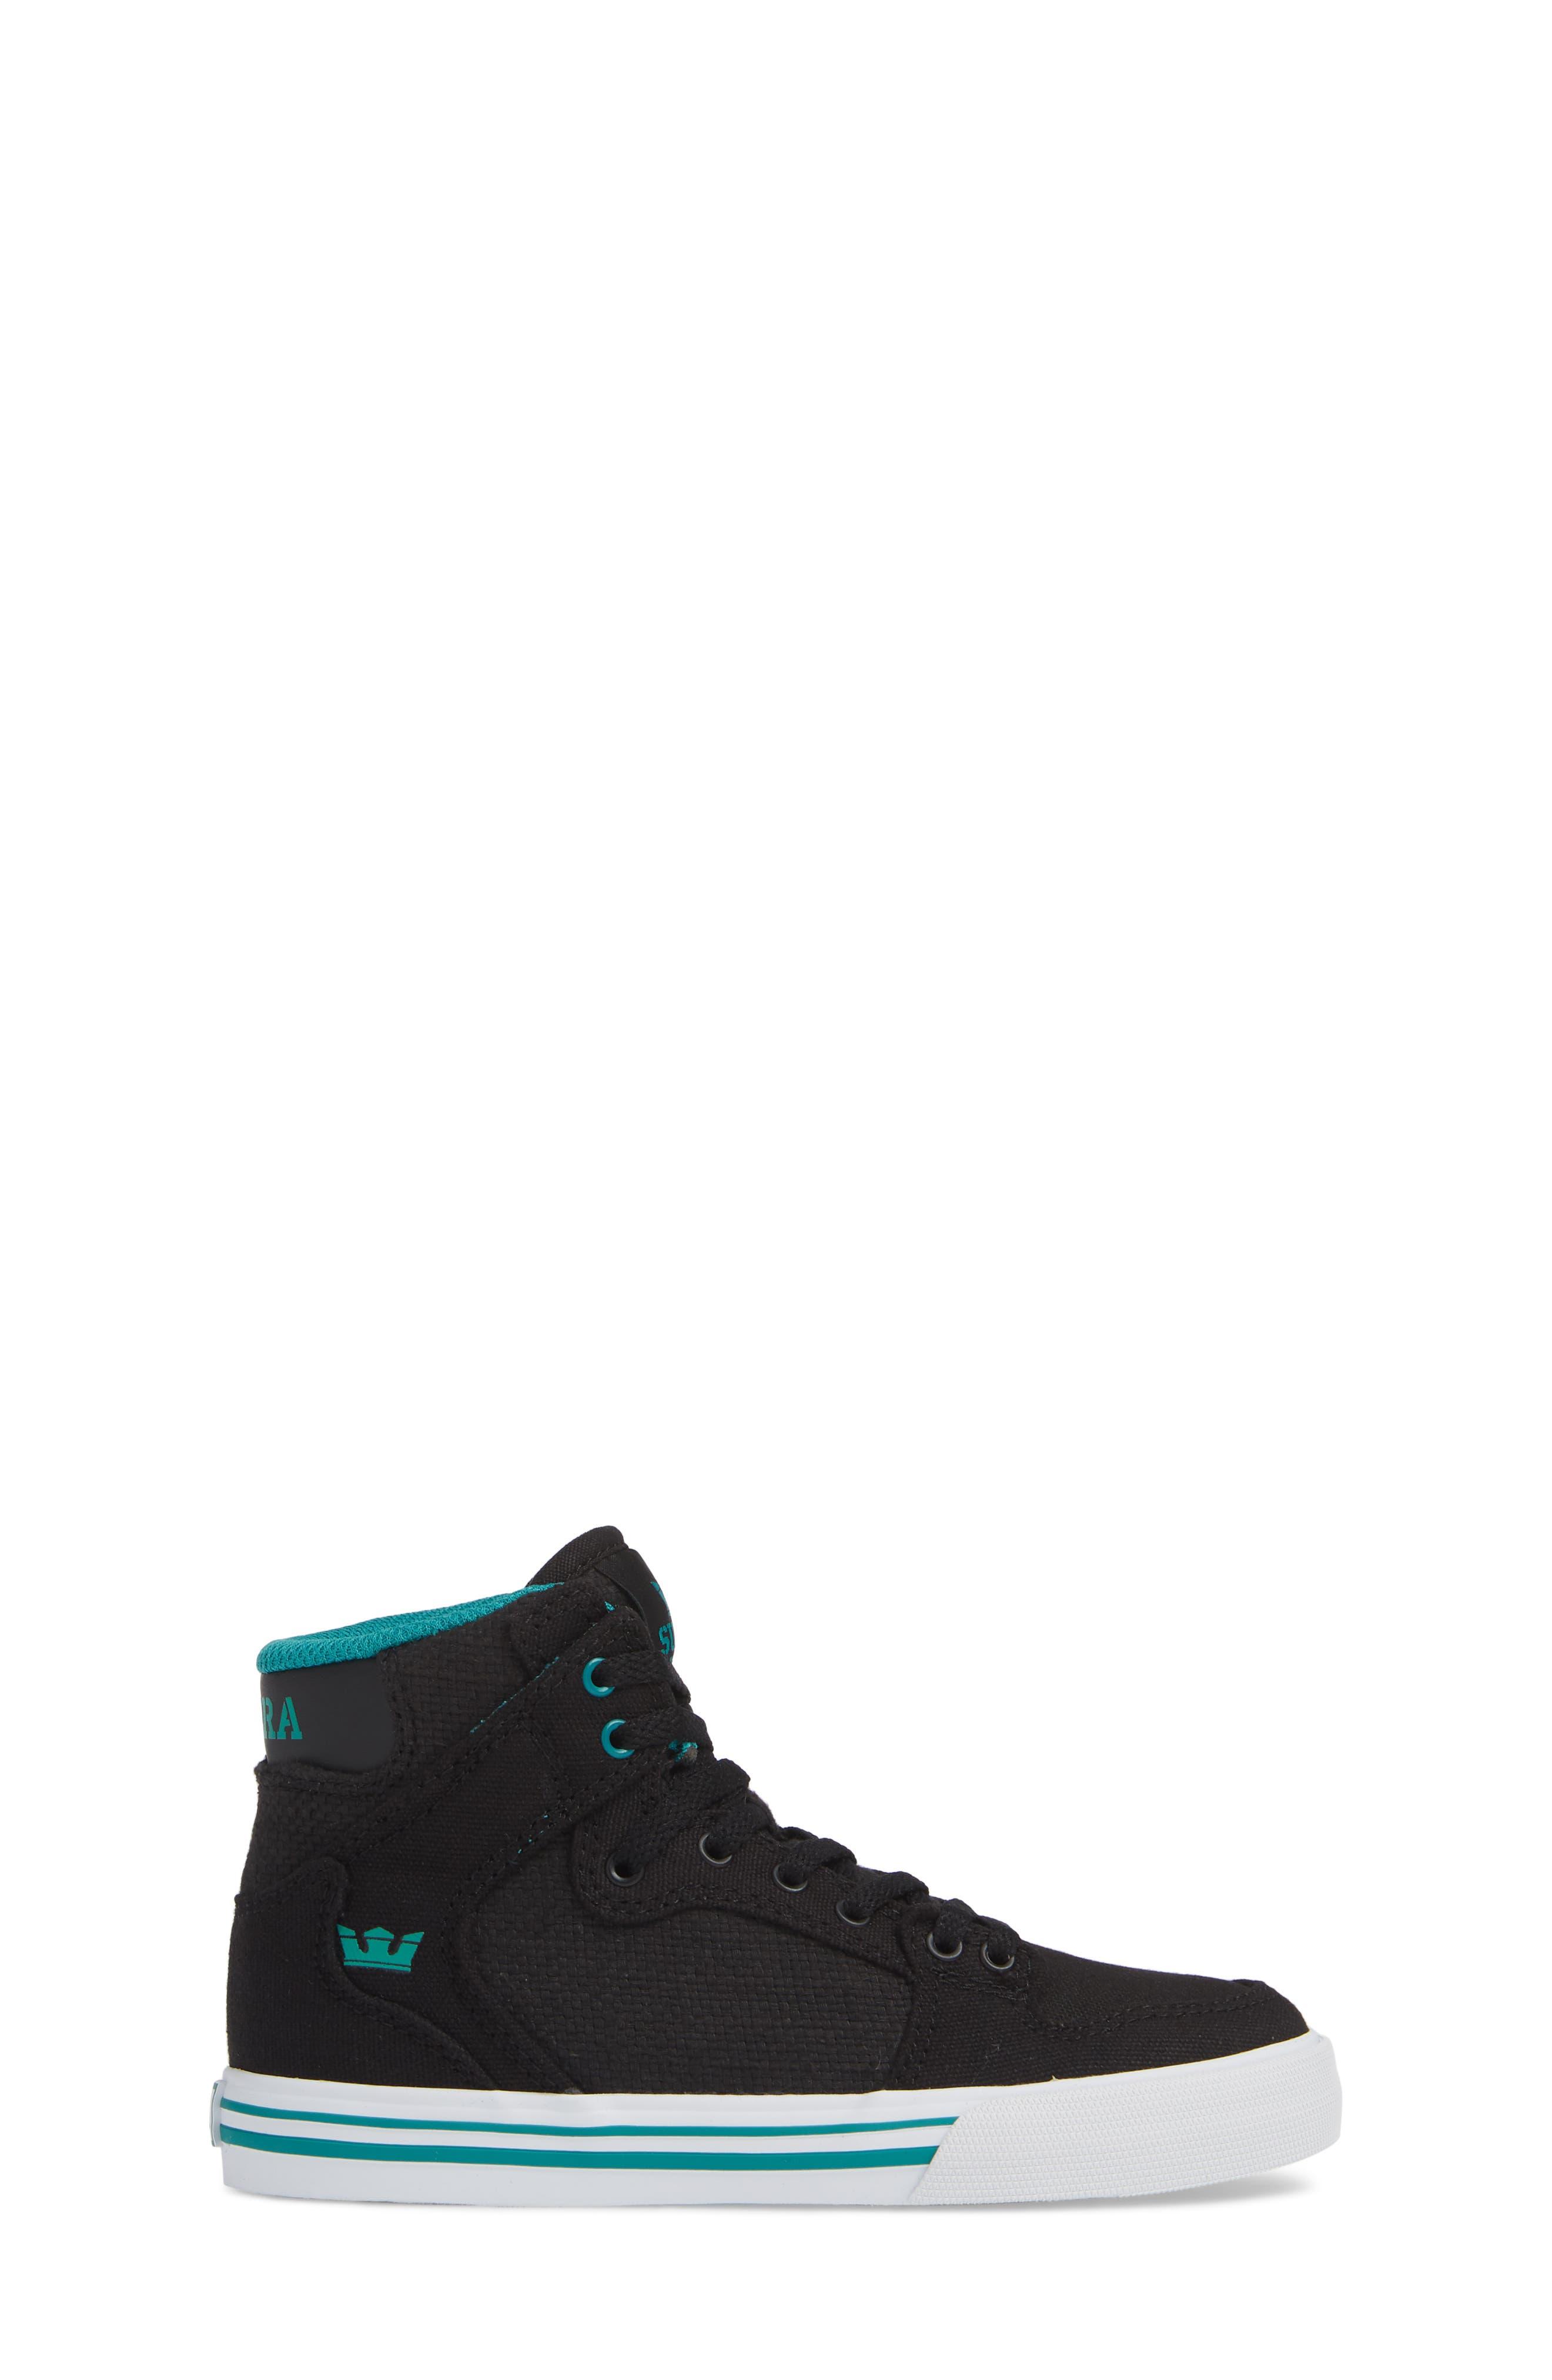 'Vaider' High Top Sneaker,                             Alternate thumbnail 3, color,                             BLACK/ TEAL